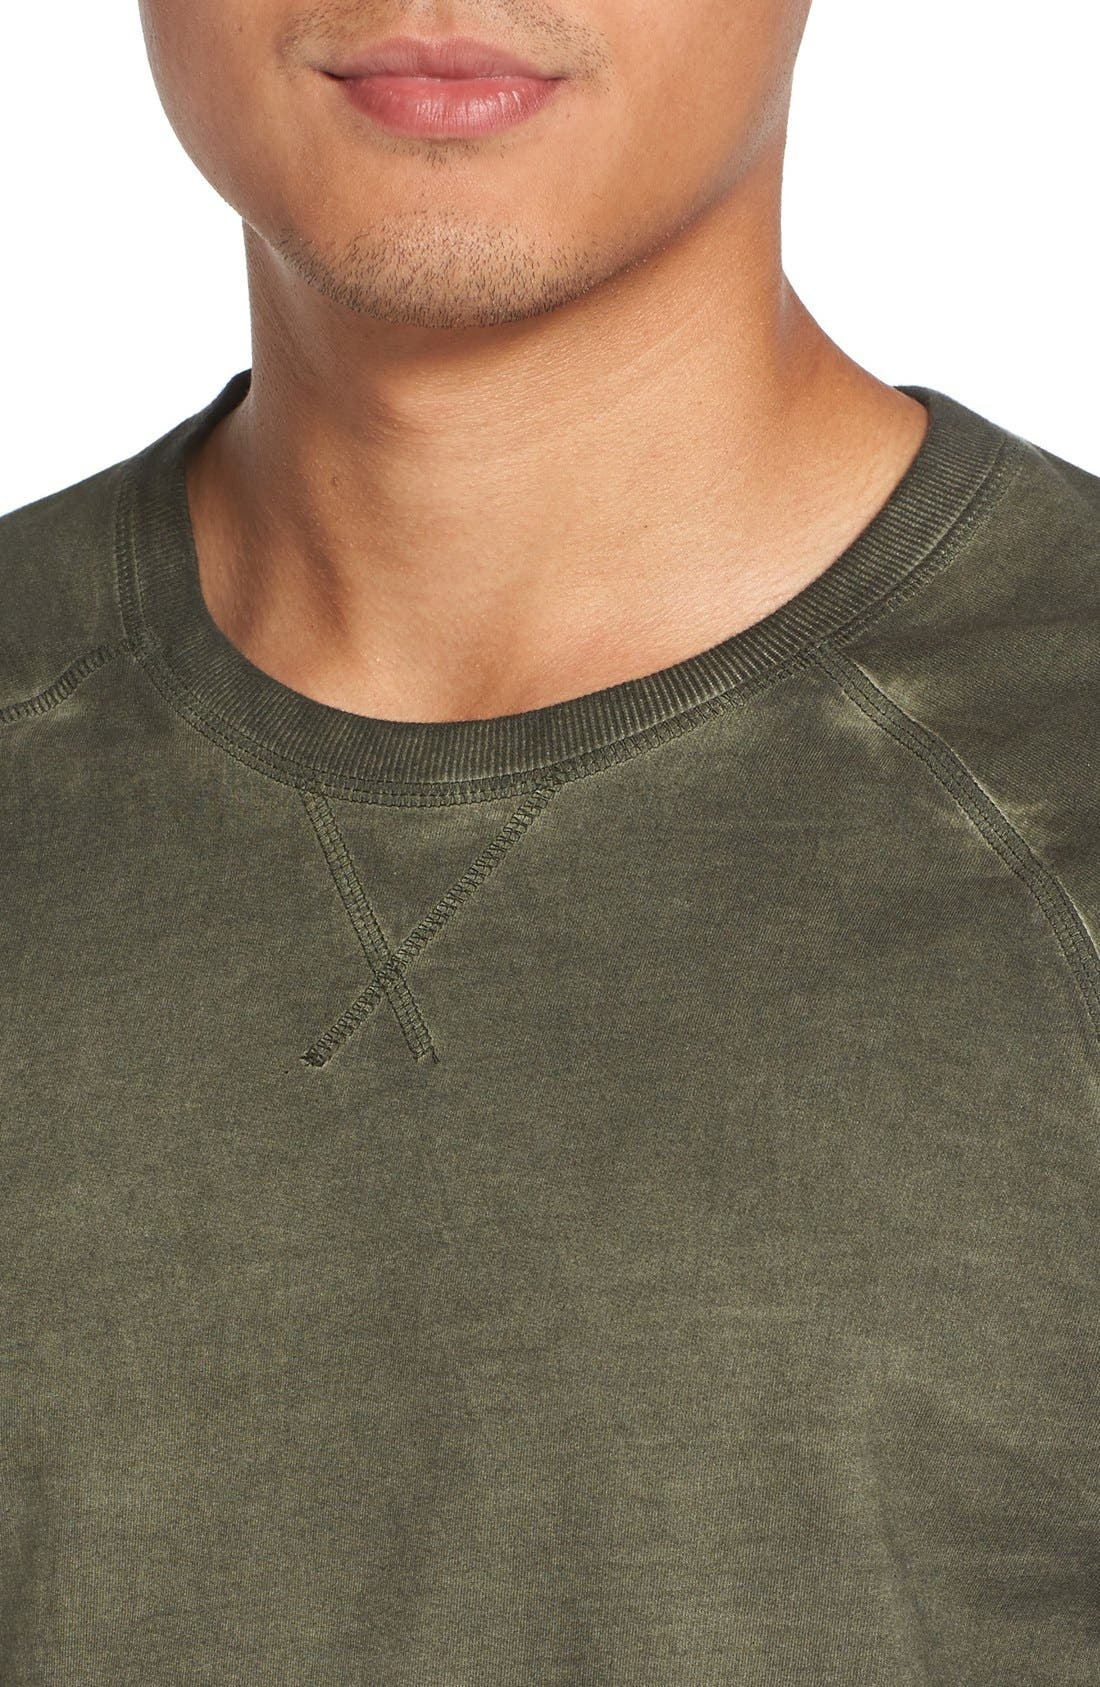 Raglan Sleeve T-Shirt,                             Alternate thumbnail 4, color,                             330